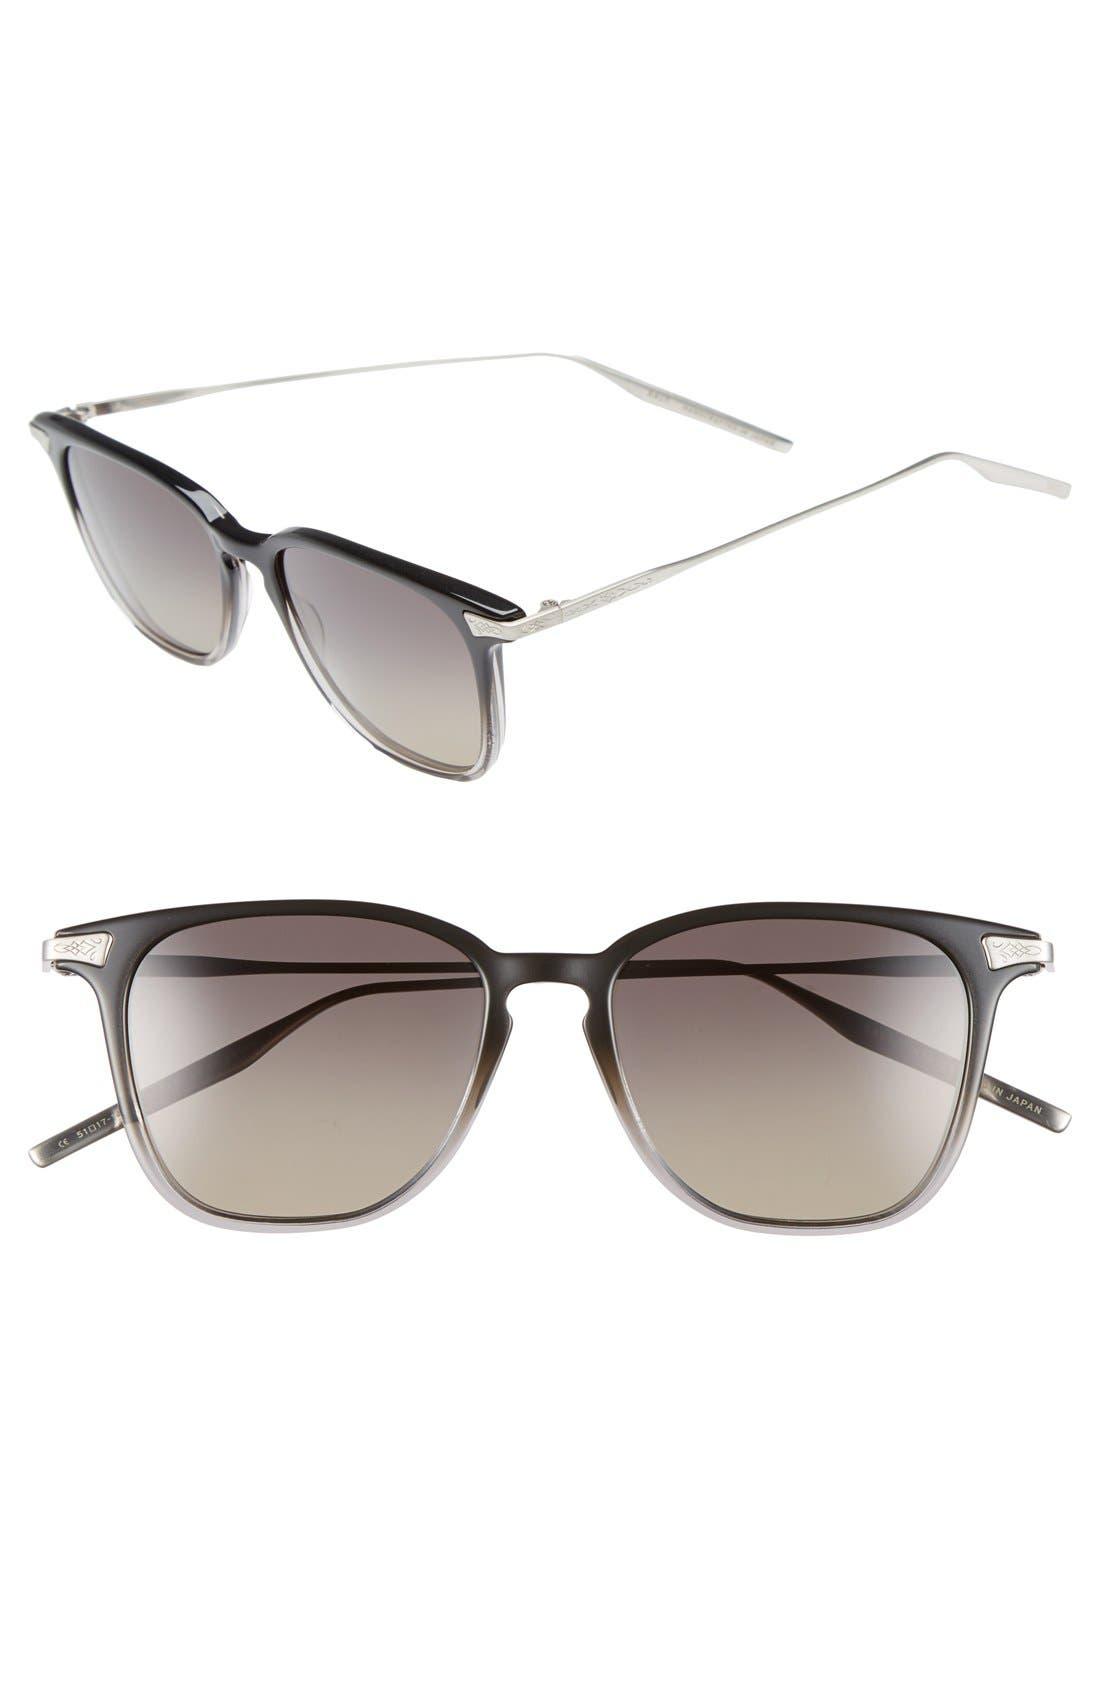 'Ridgeway' 51mm Polarized Sunglasses,                             Main thumbnail 1, color,                             LEAD GRADIENT/ GREY